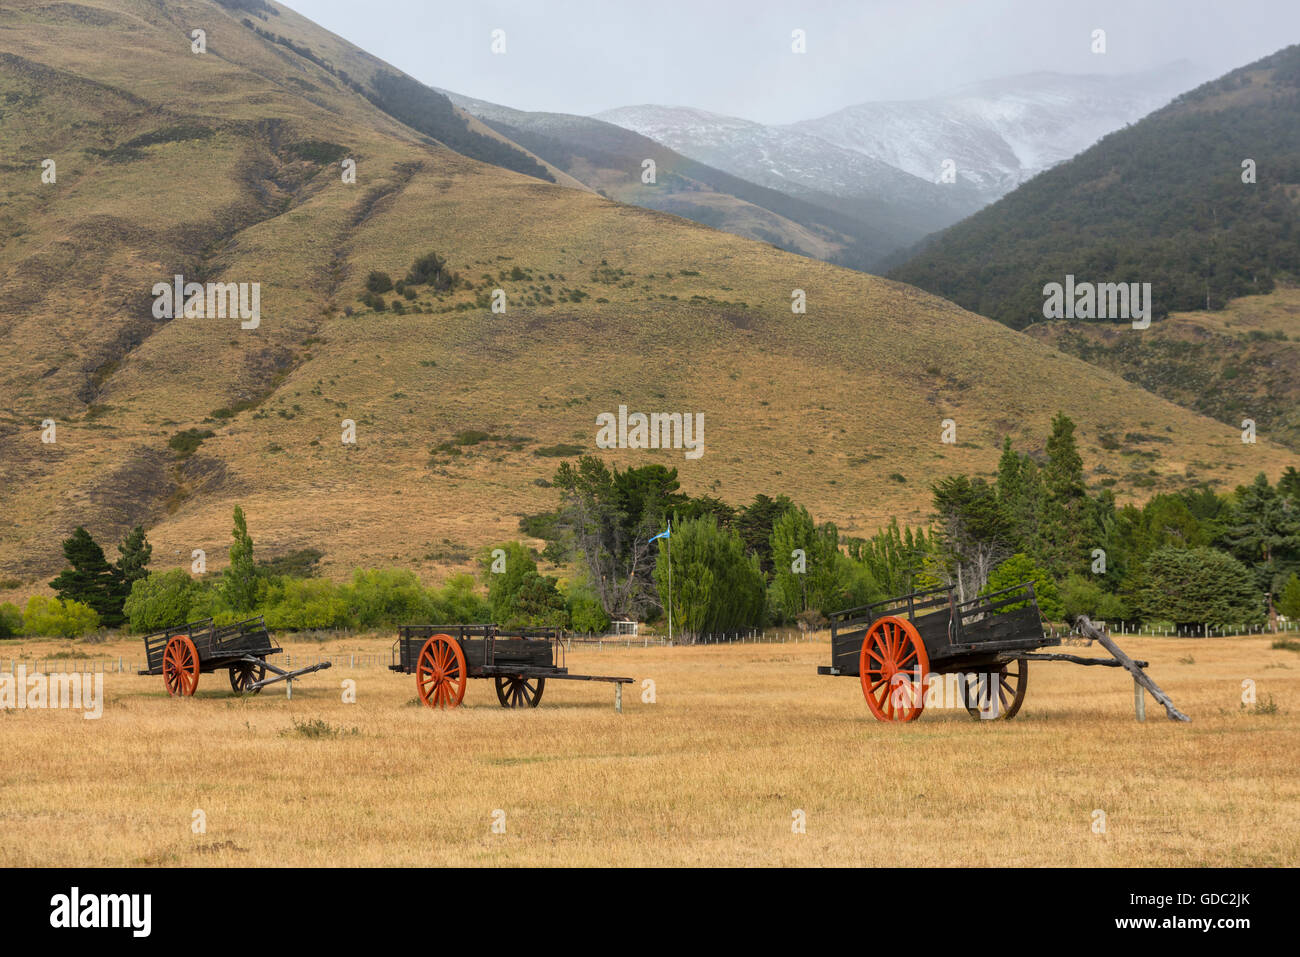 South America,Argentina,Patagonia,Santa Cruz,Puerta Bandera - Stock Image